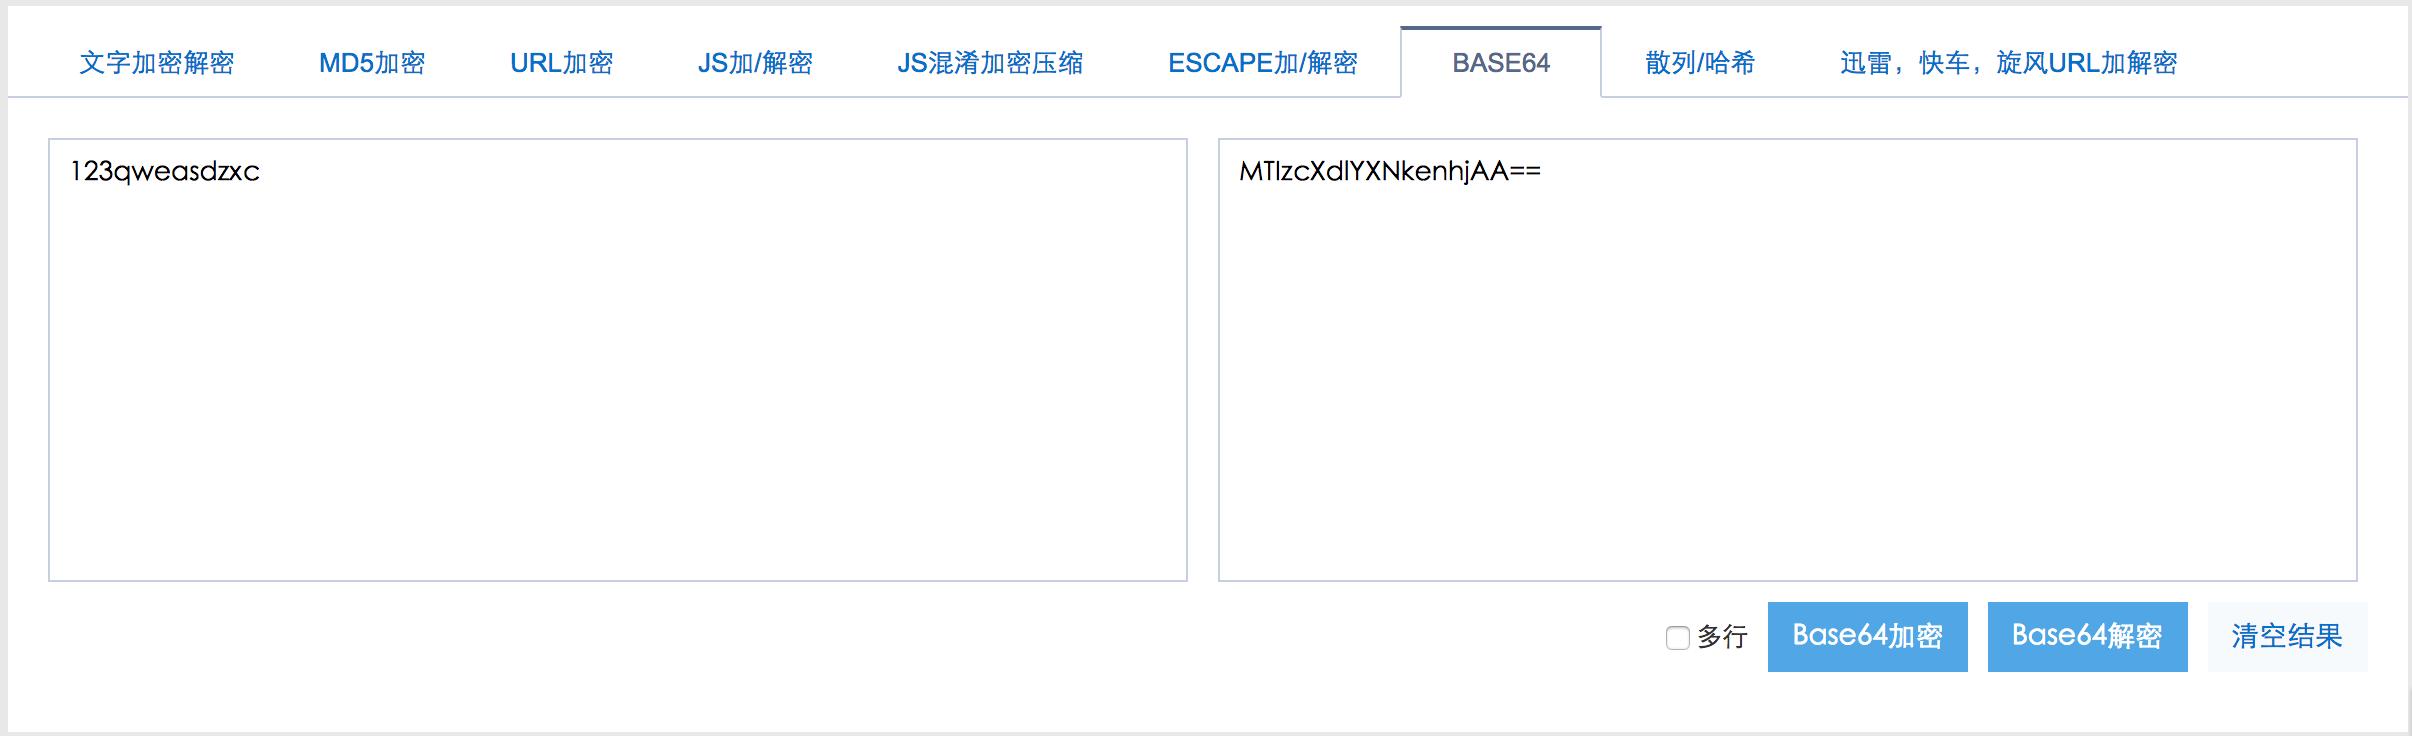 hg200g_007